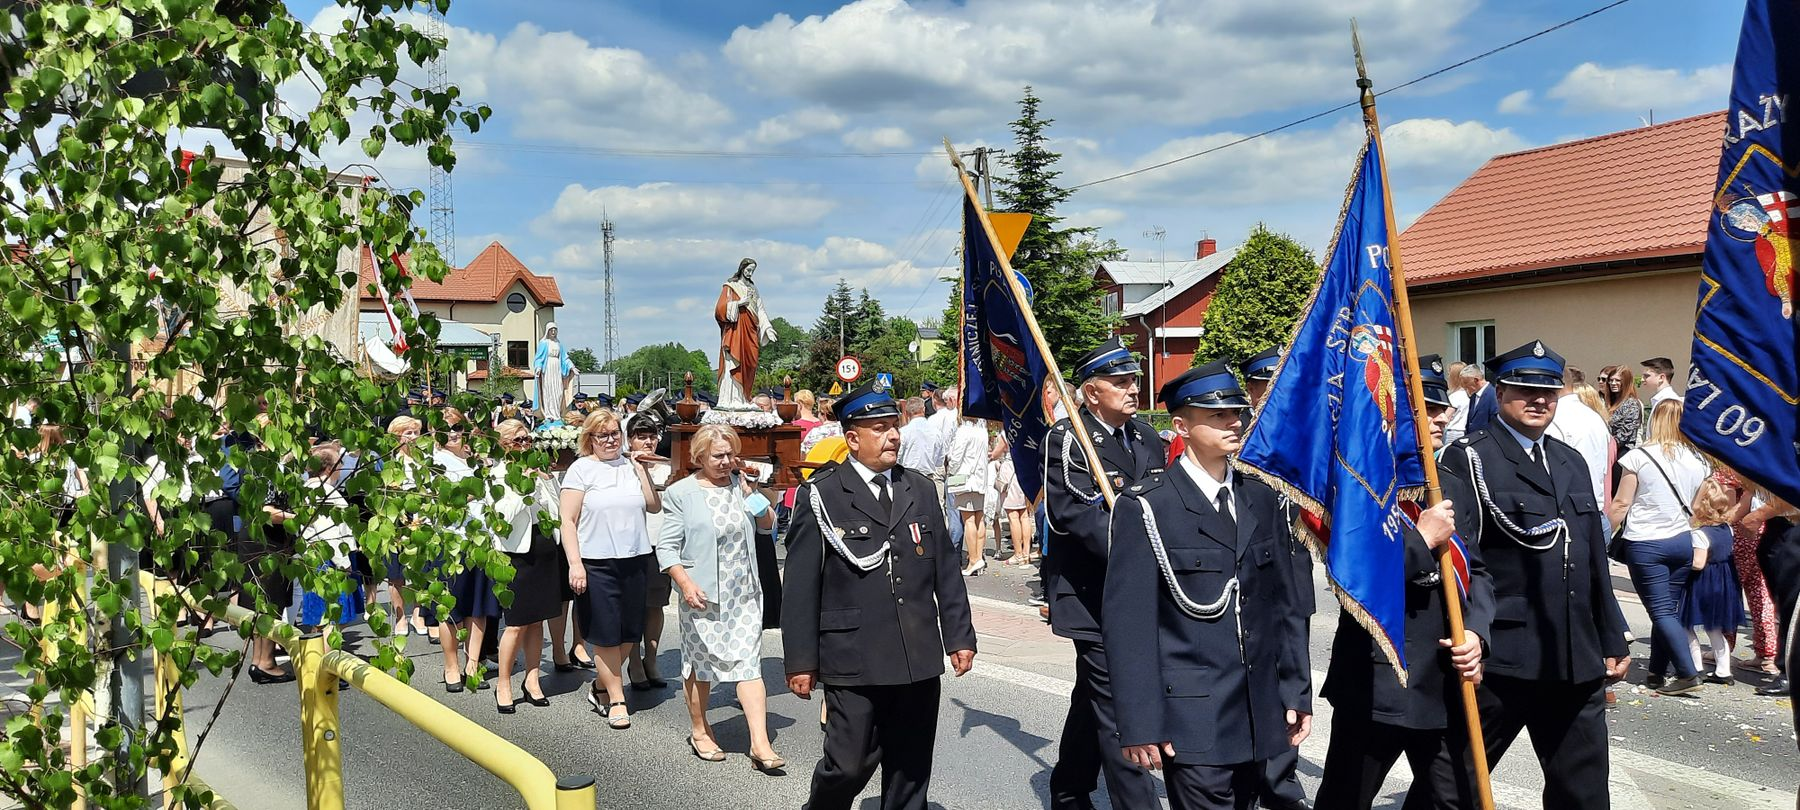 Boże Ciało праздник религия Польша